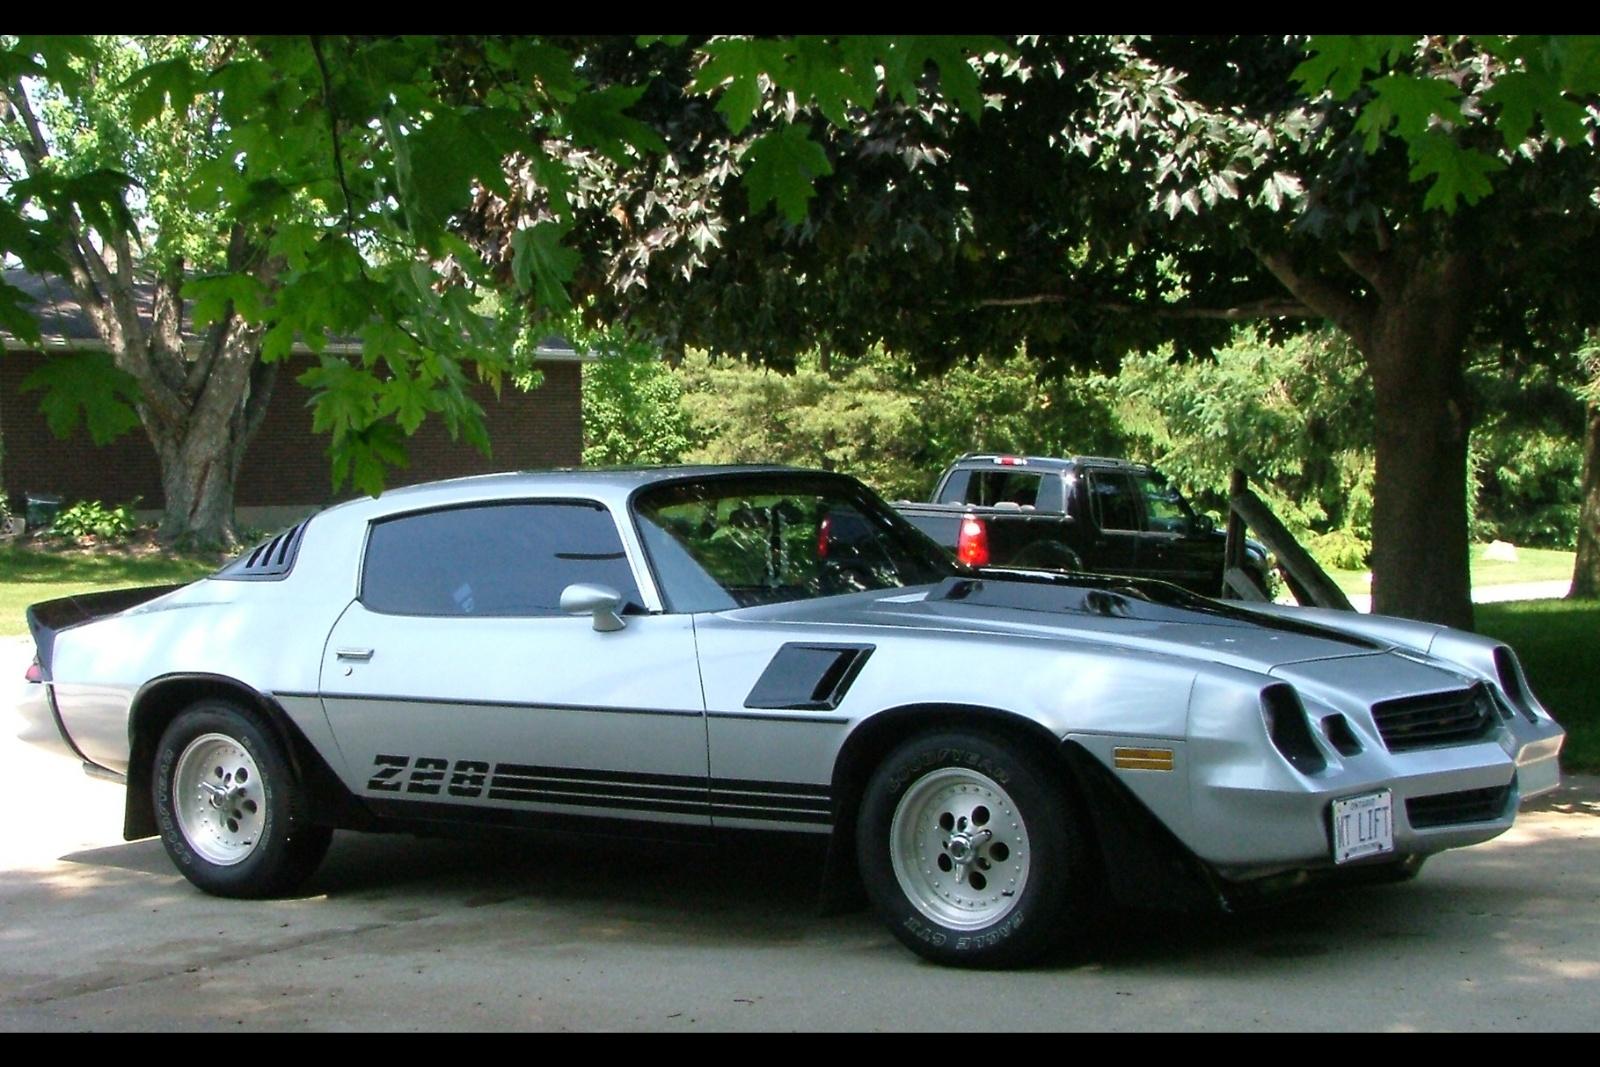 1981 chevrolet camaro - pictures